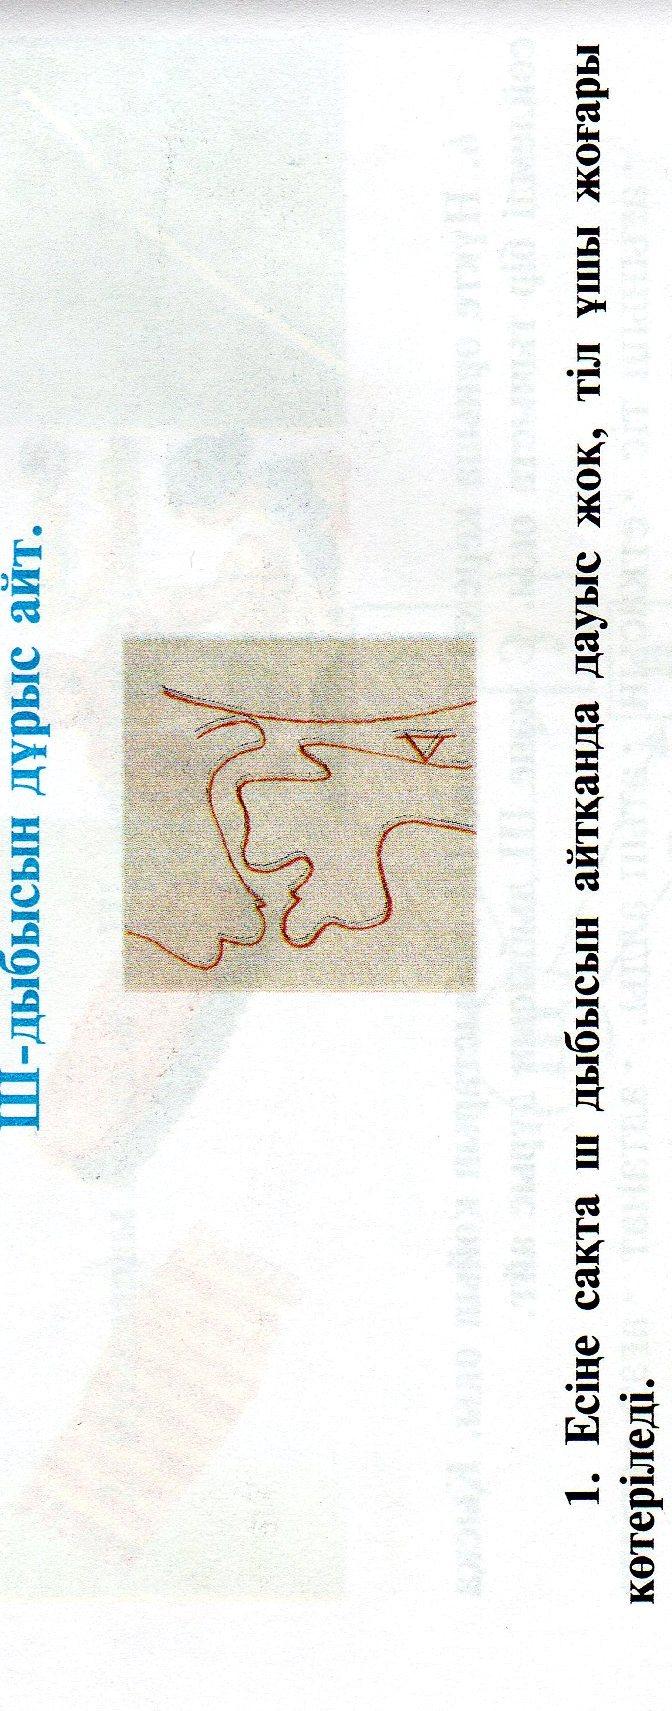 C:\Documents and Settings\Пользователь\Мои документы\Мои рисунки\img077.jpg